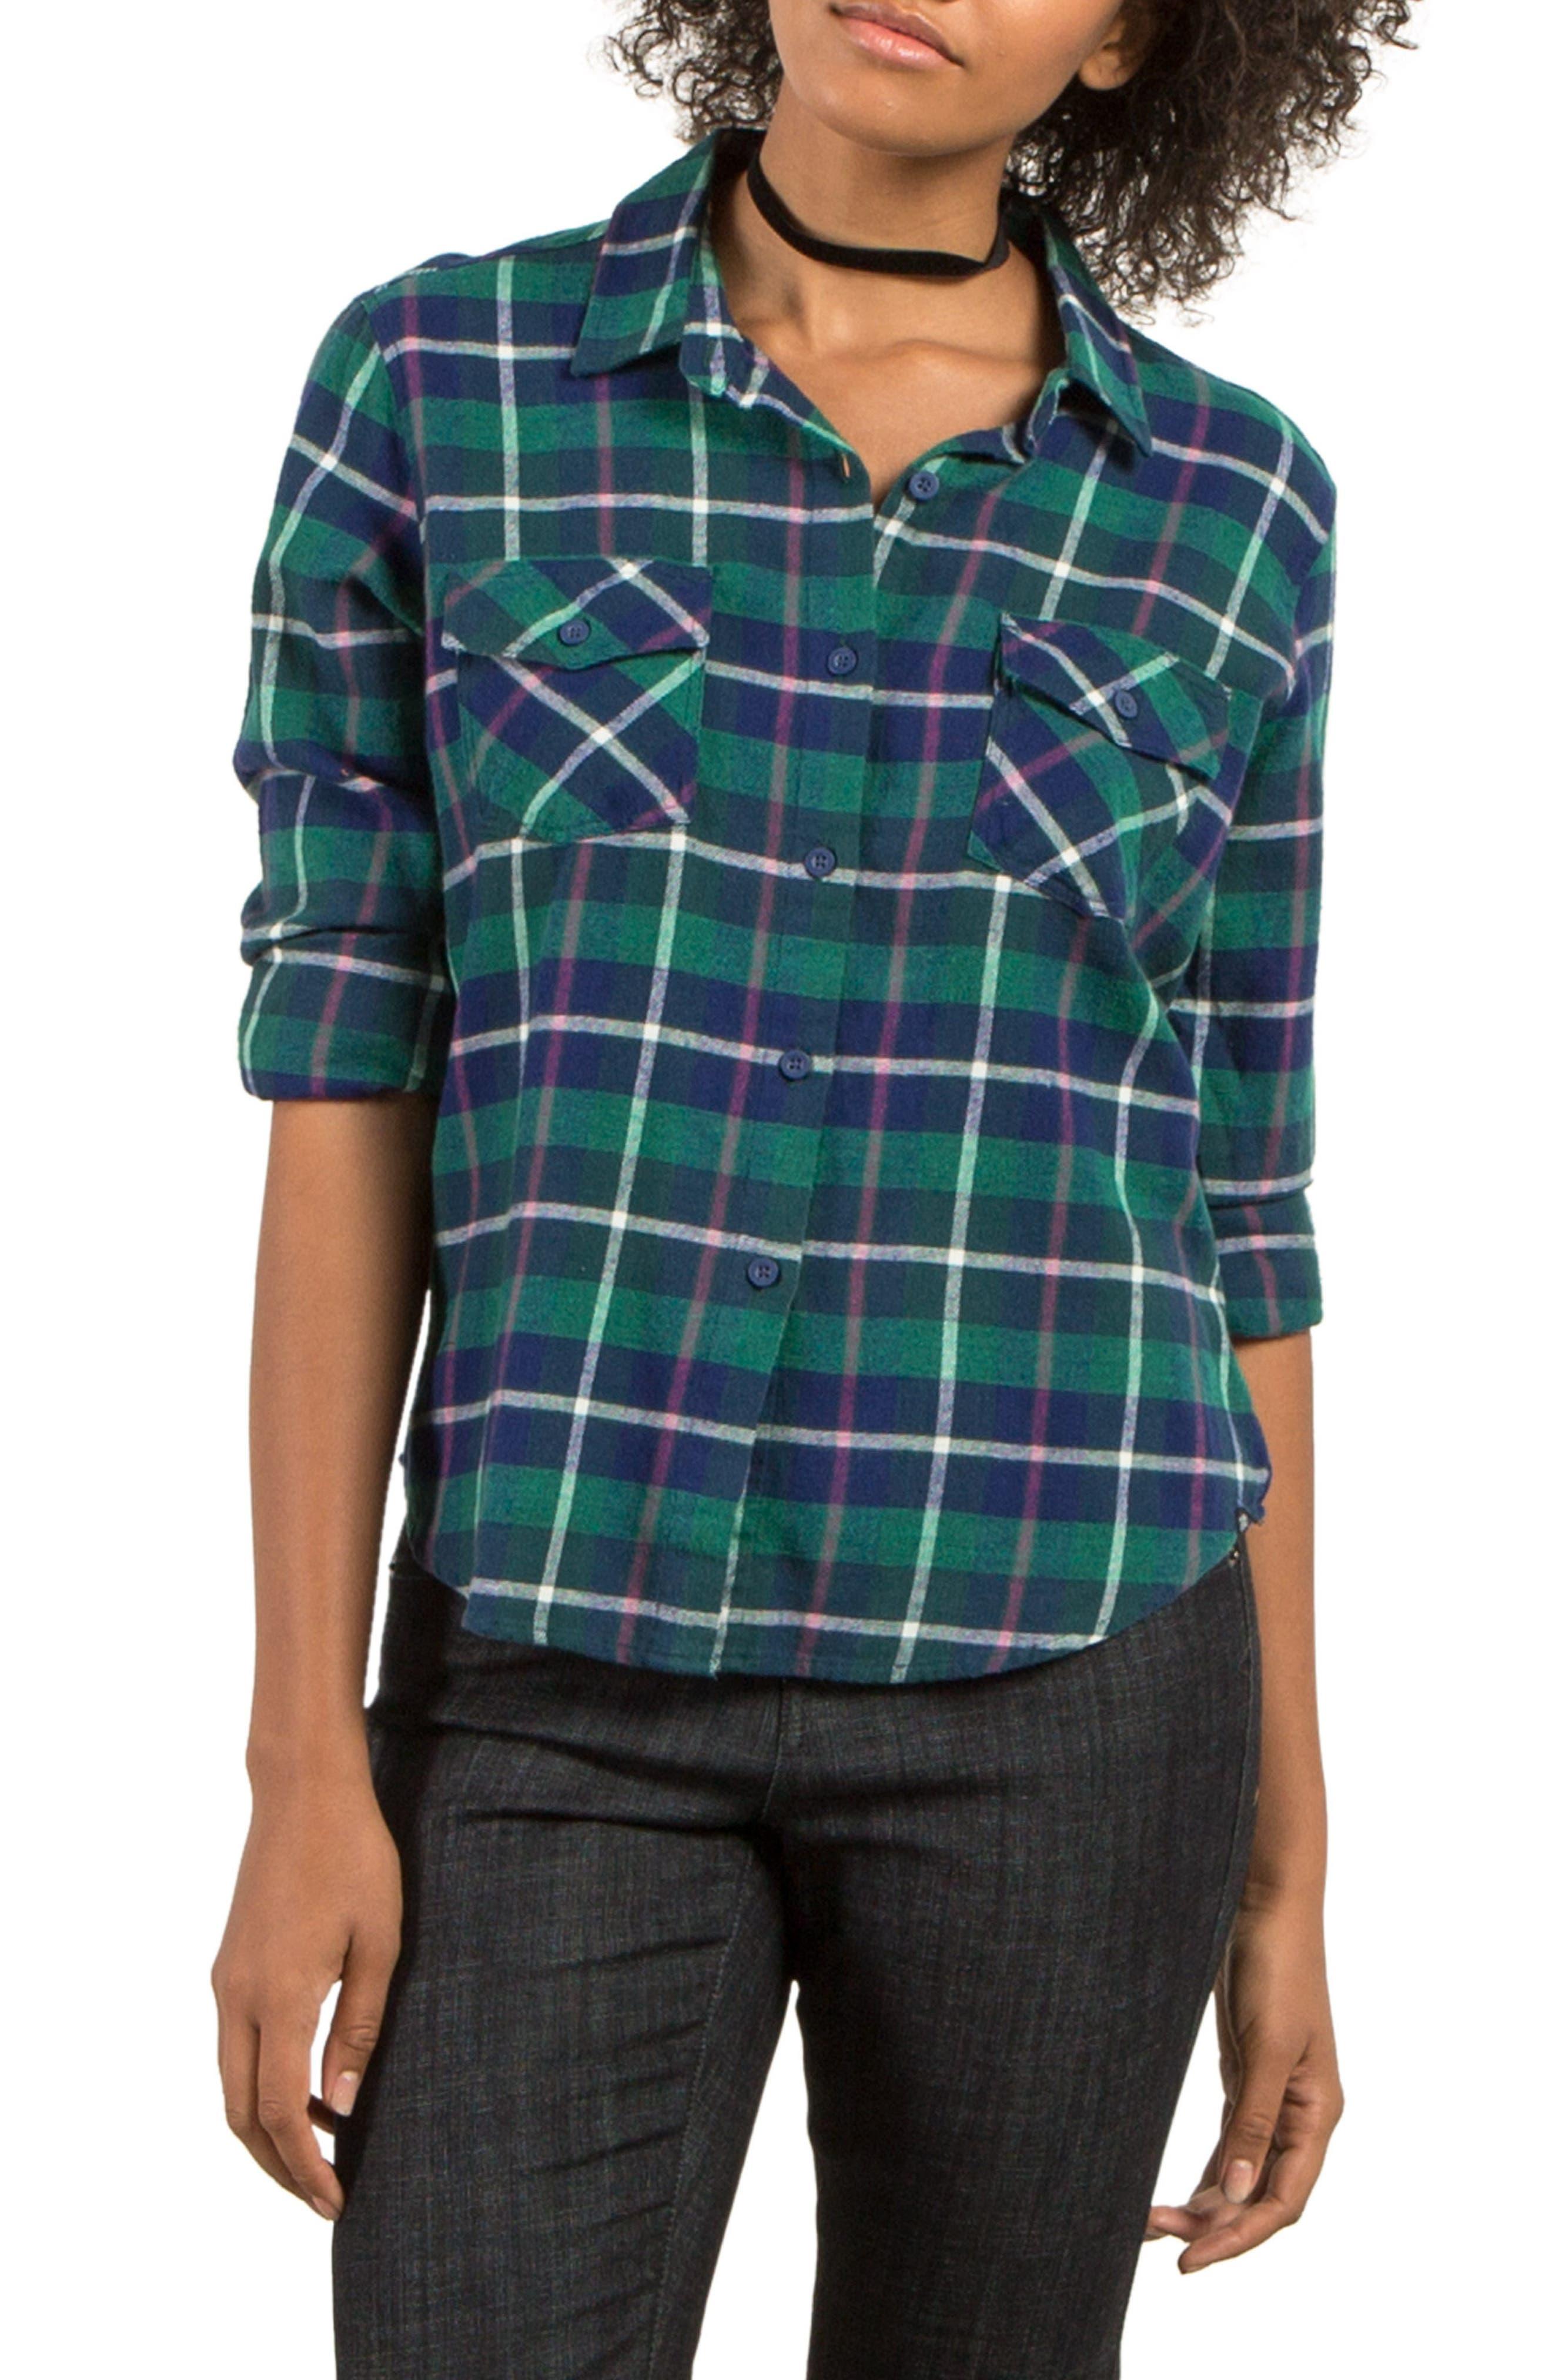 Volcom New Flame Plaid Flannel Shirt